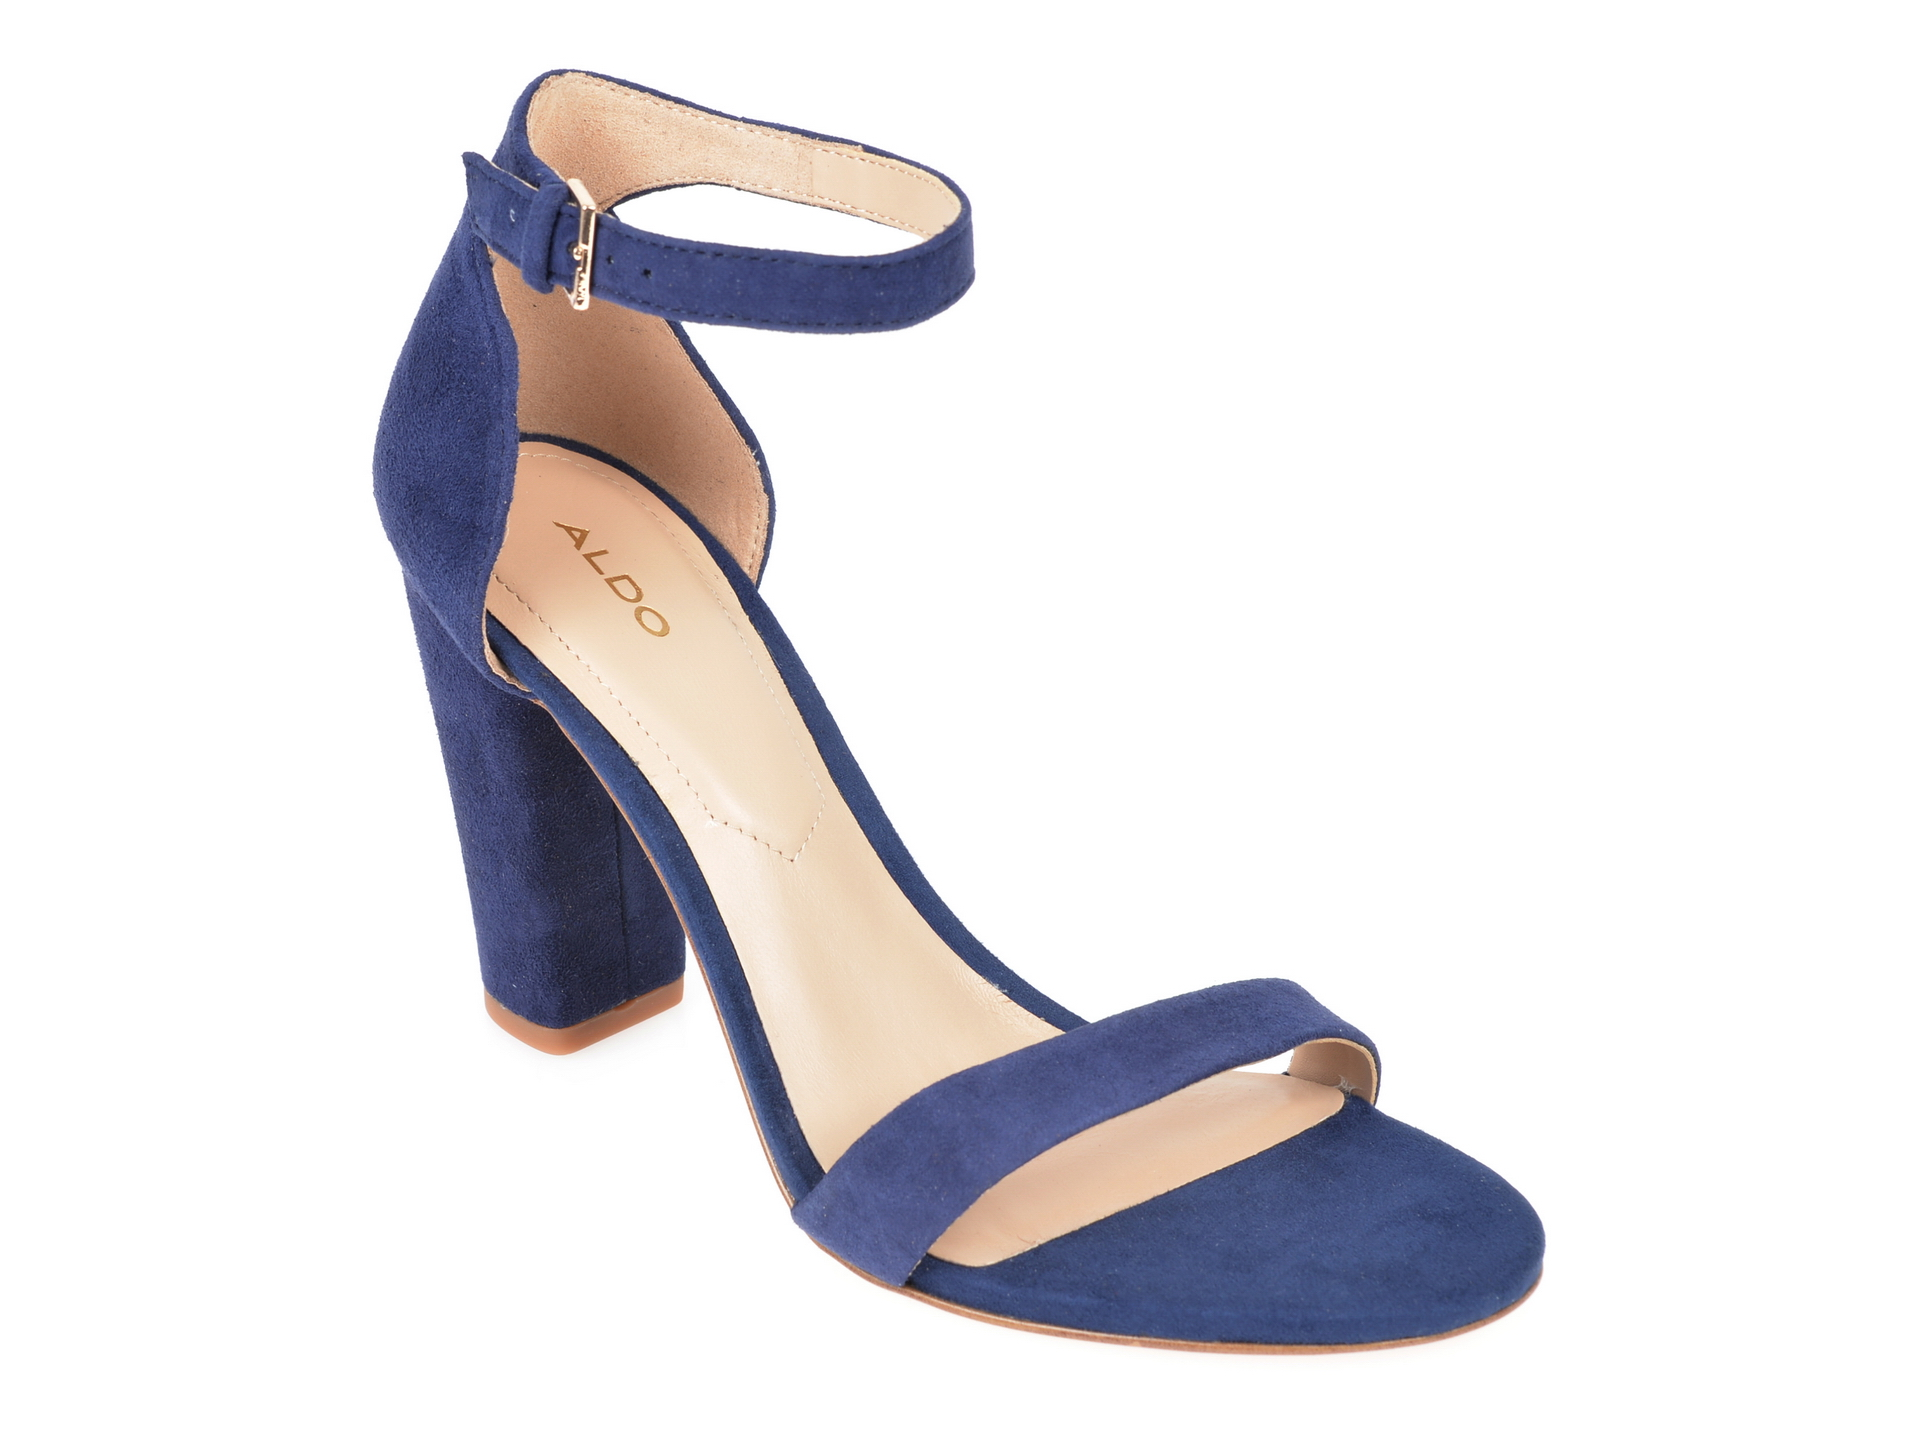 Sandale ALDO bleumarin, Jerayclya410, din piele intoarsa imagine otter.ro